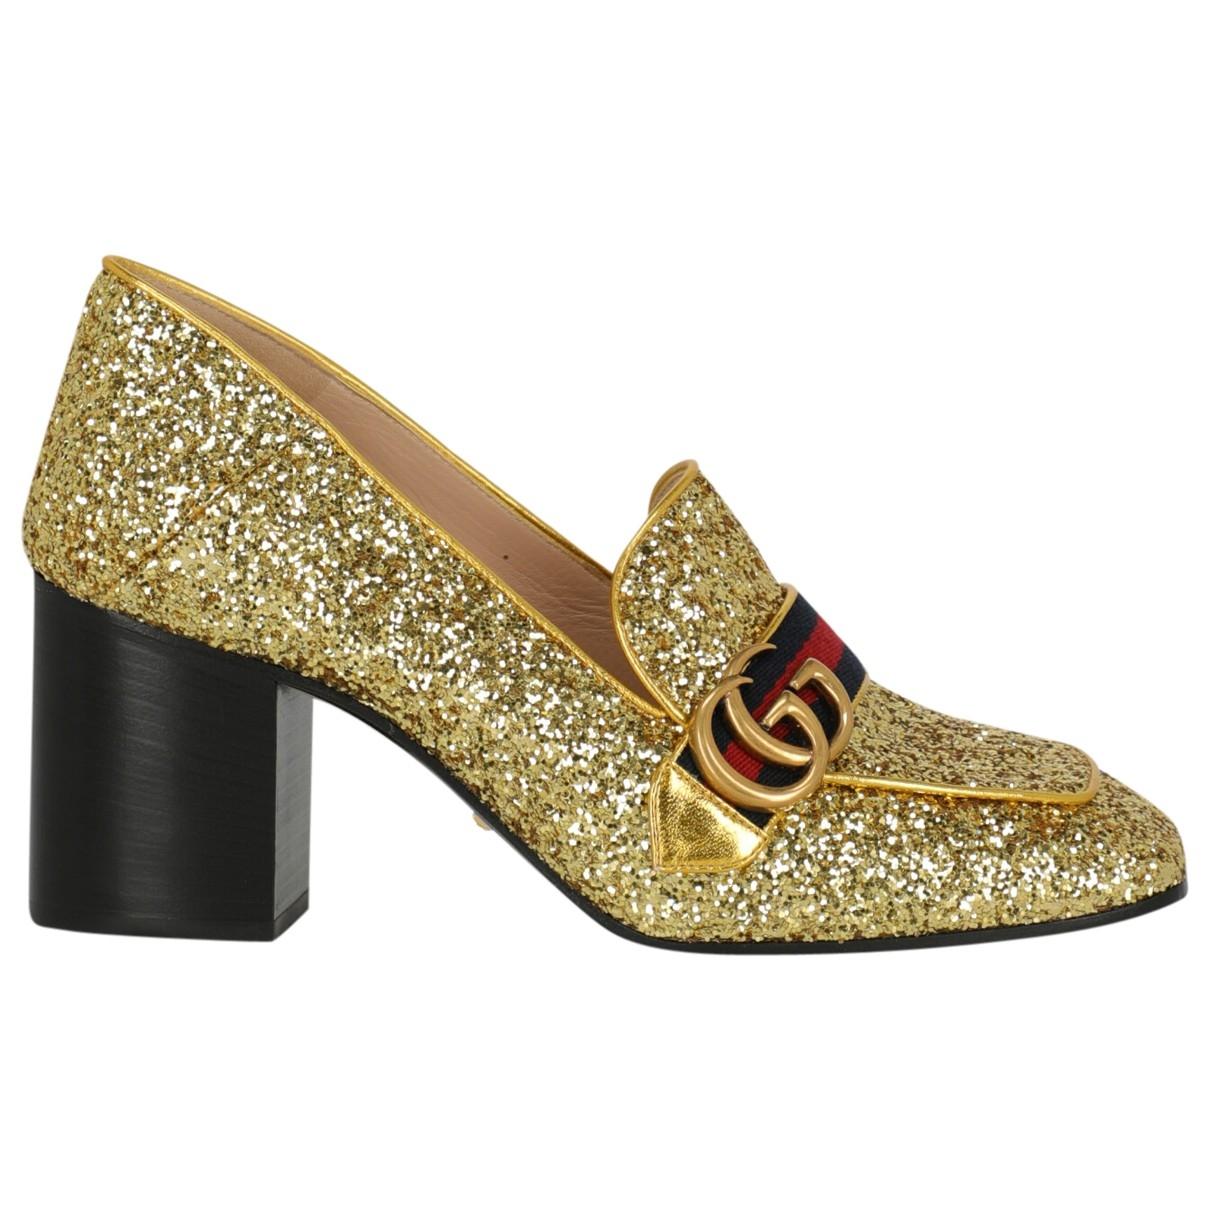 Gucci Peyton Gold Glitter Heels for Women 40 IT